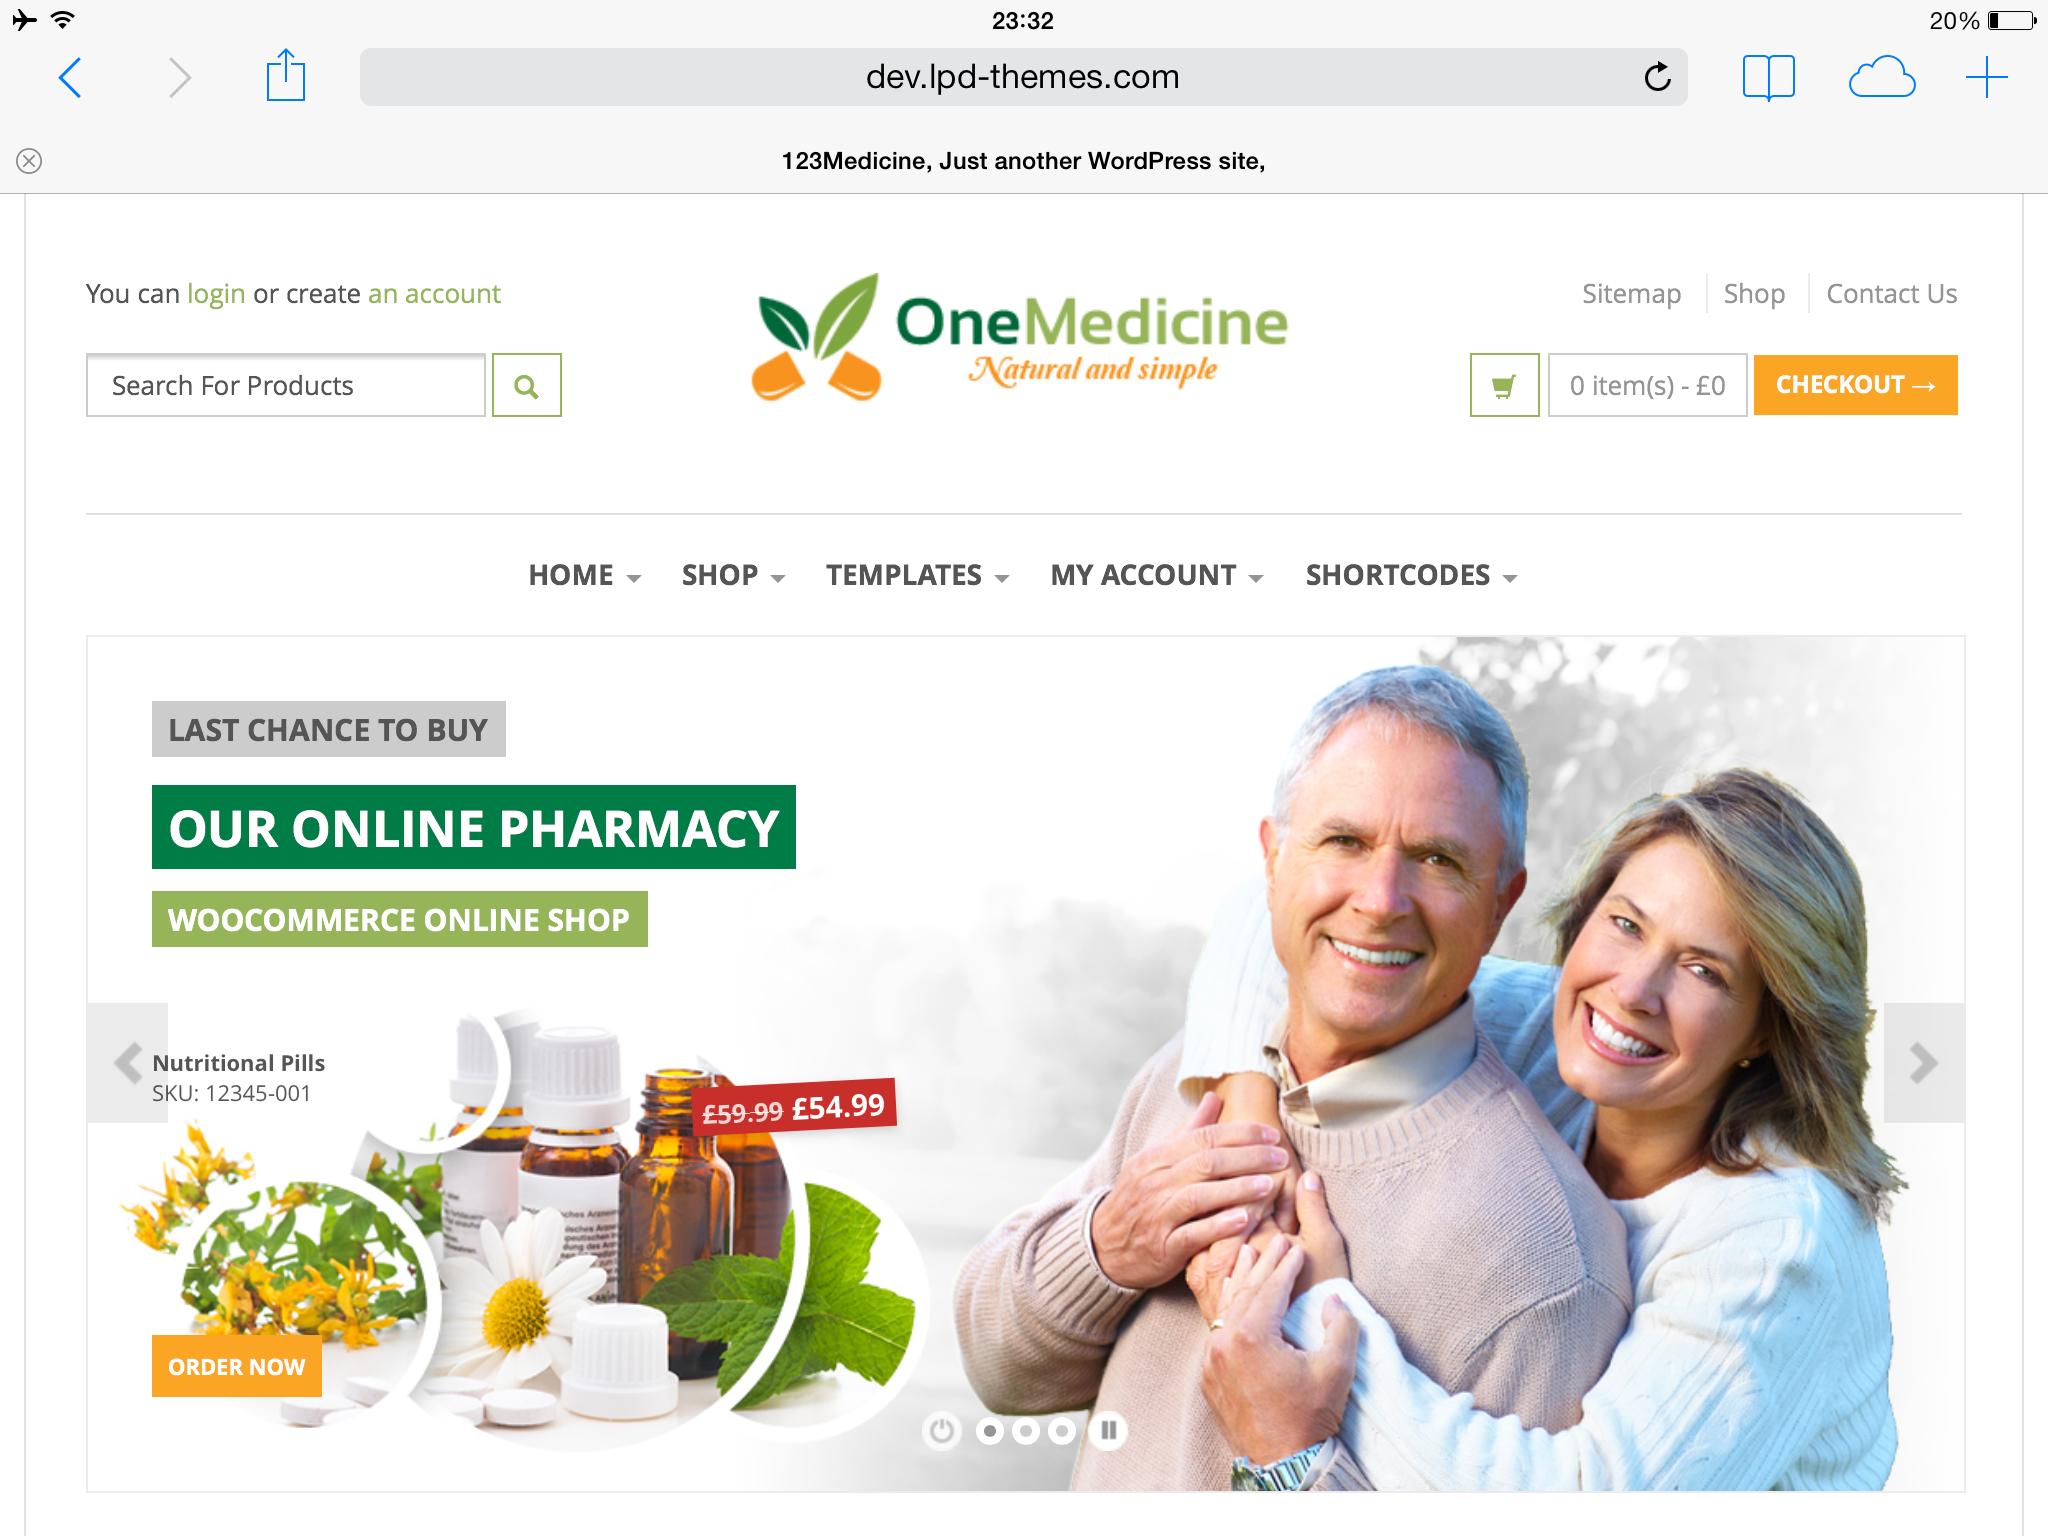 123 Medicine Pharmacy Shop Hospital Medical Health Service